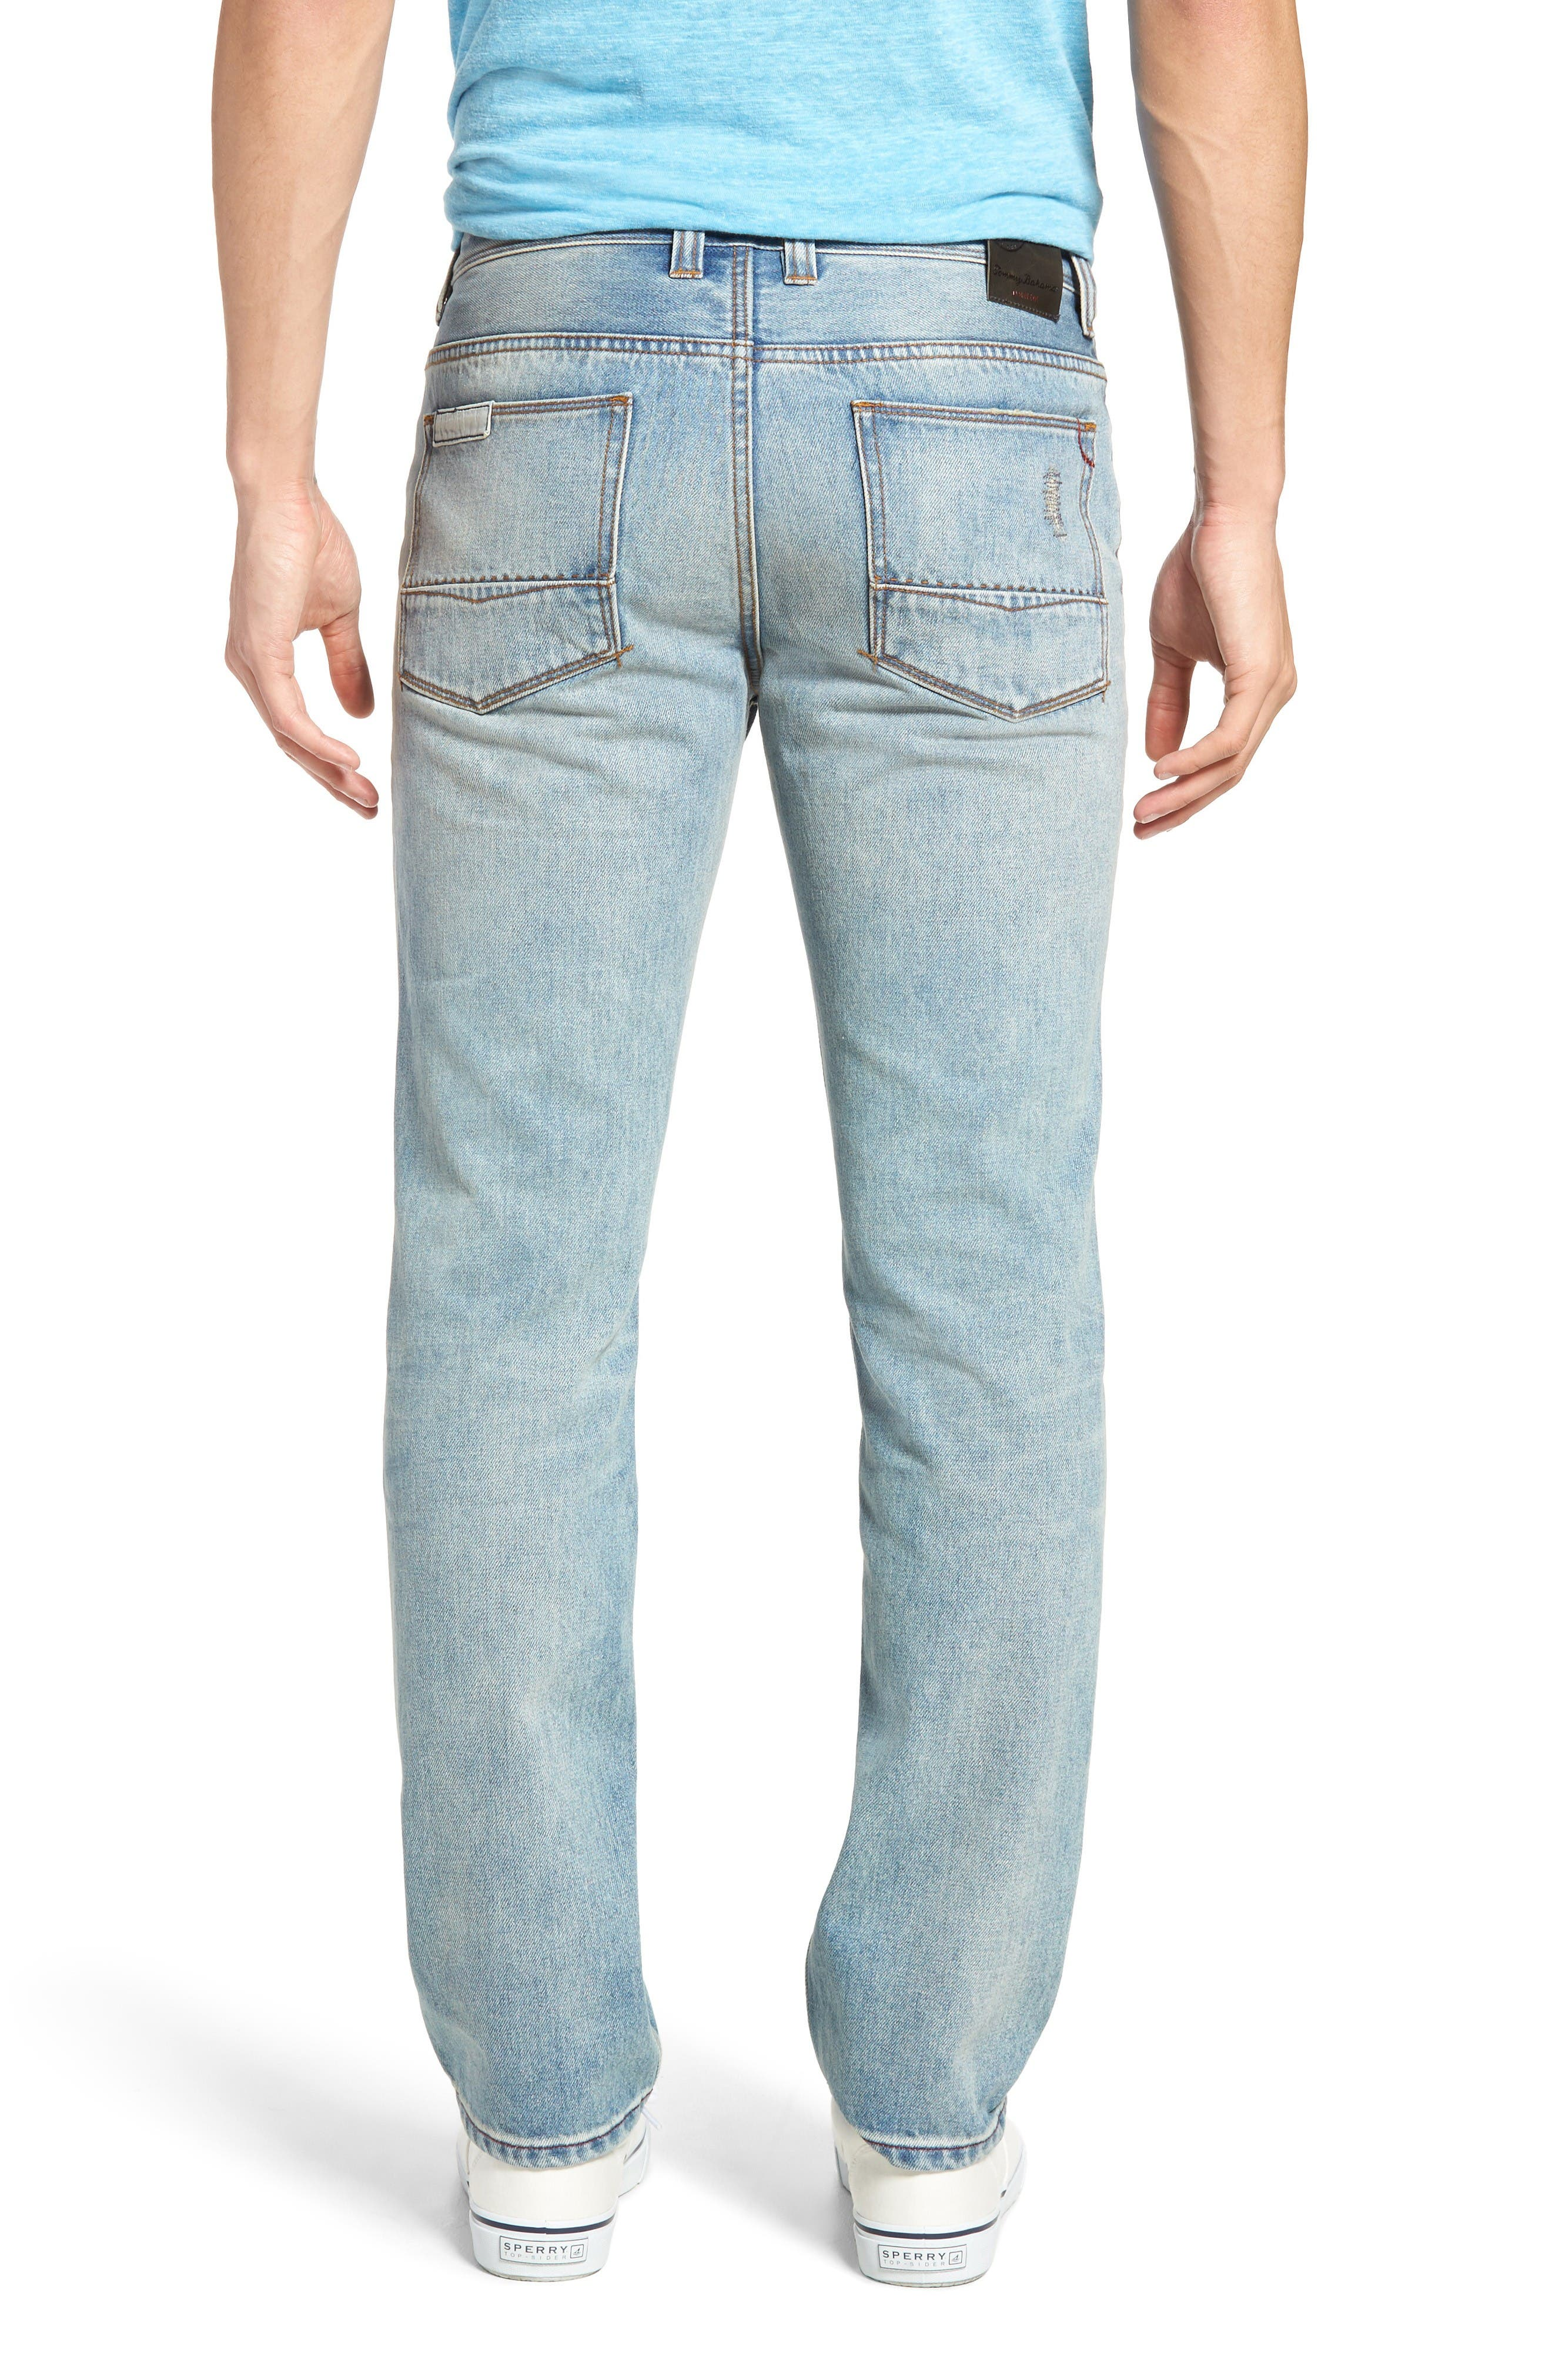 Castaway Slim Fit Jeans,                             Alternate thumbnail 2, color,                             Bleached Vintage Wash